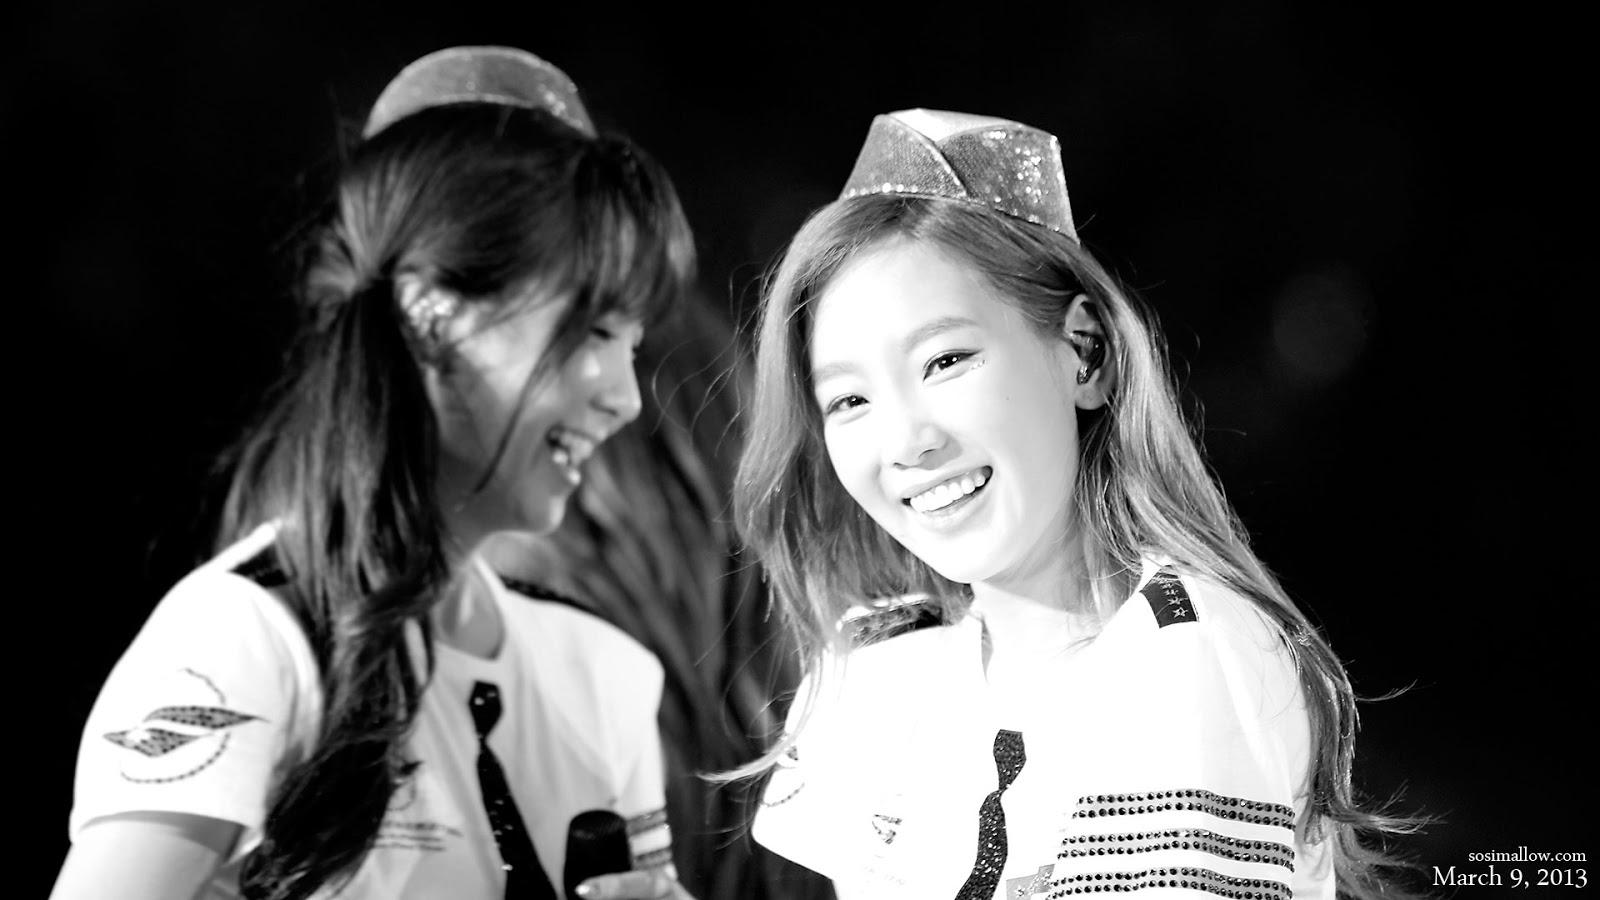 Jessica dating Cyrano OST